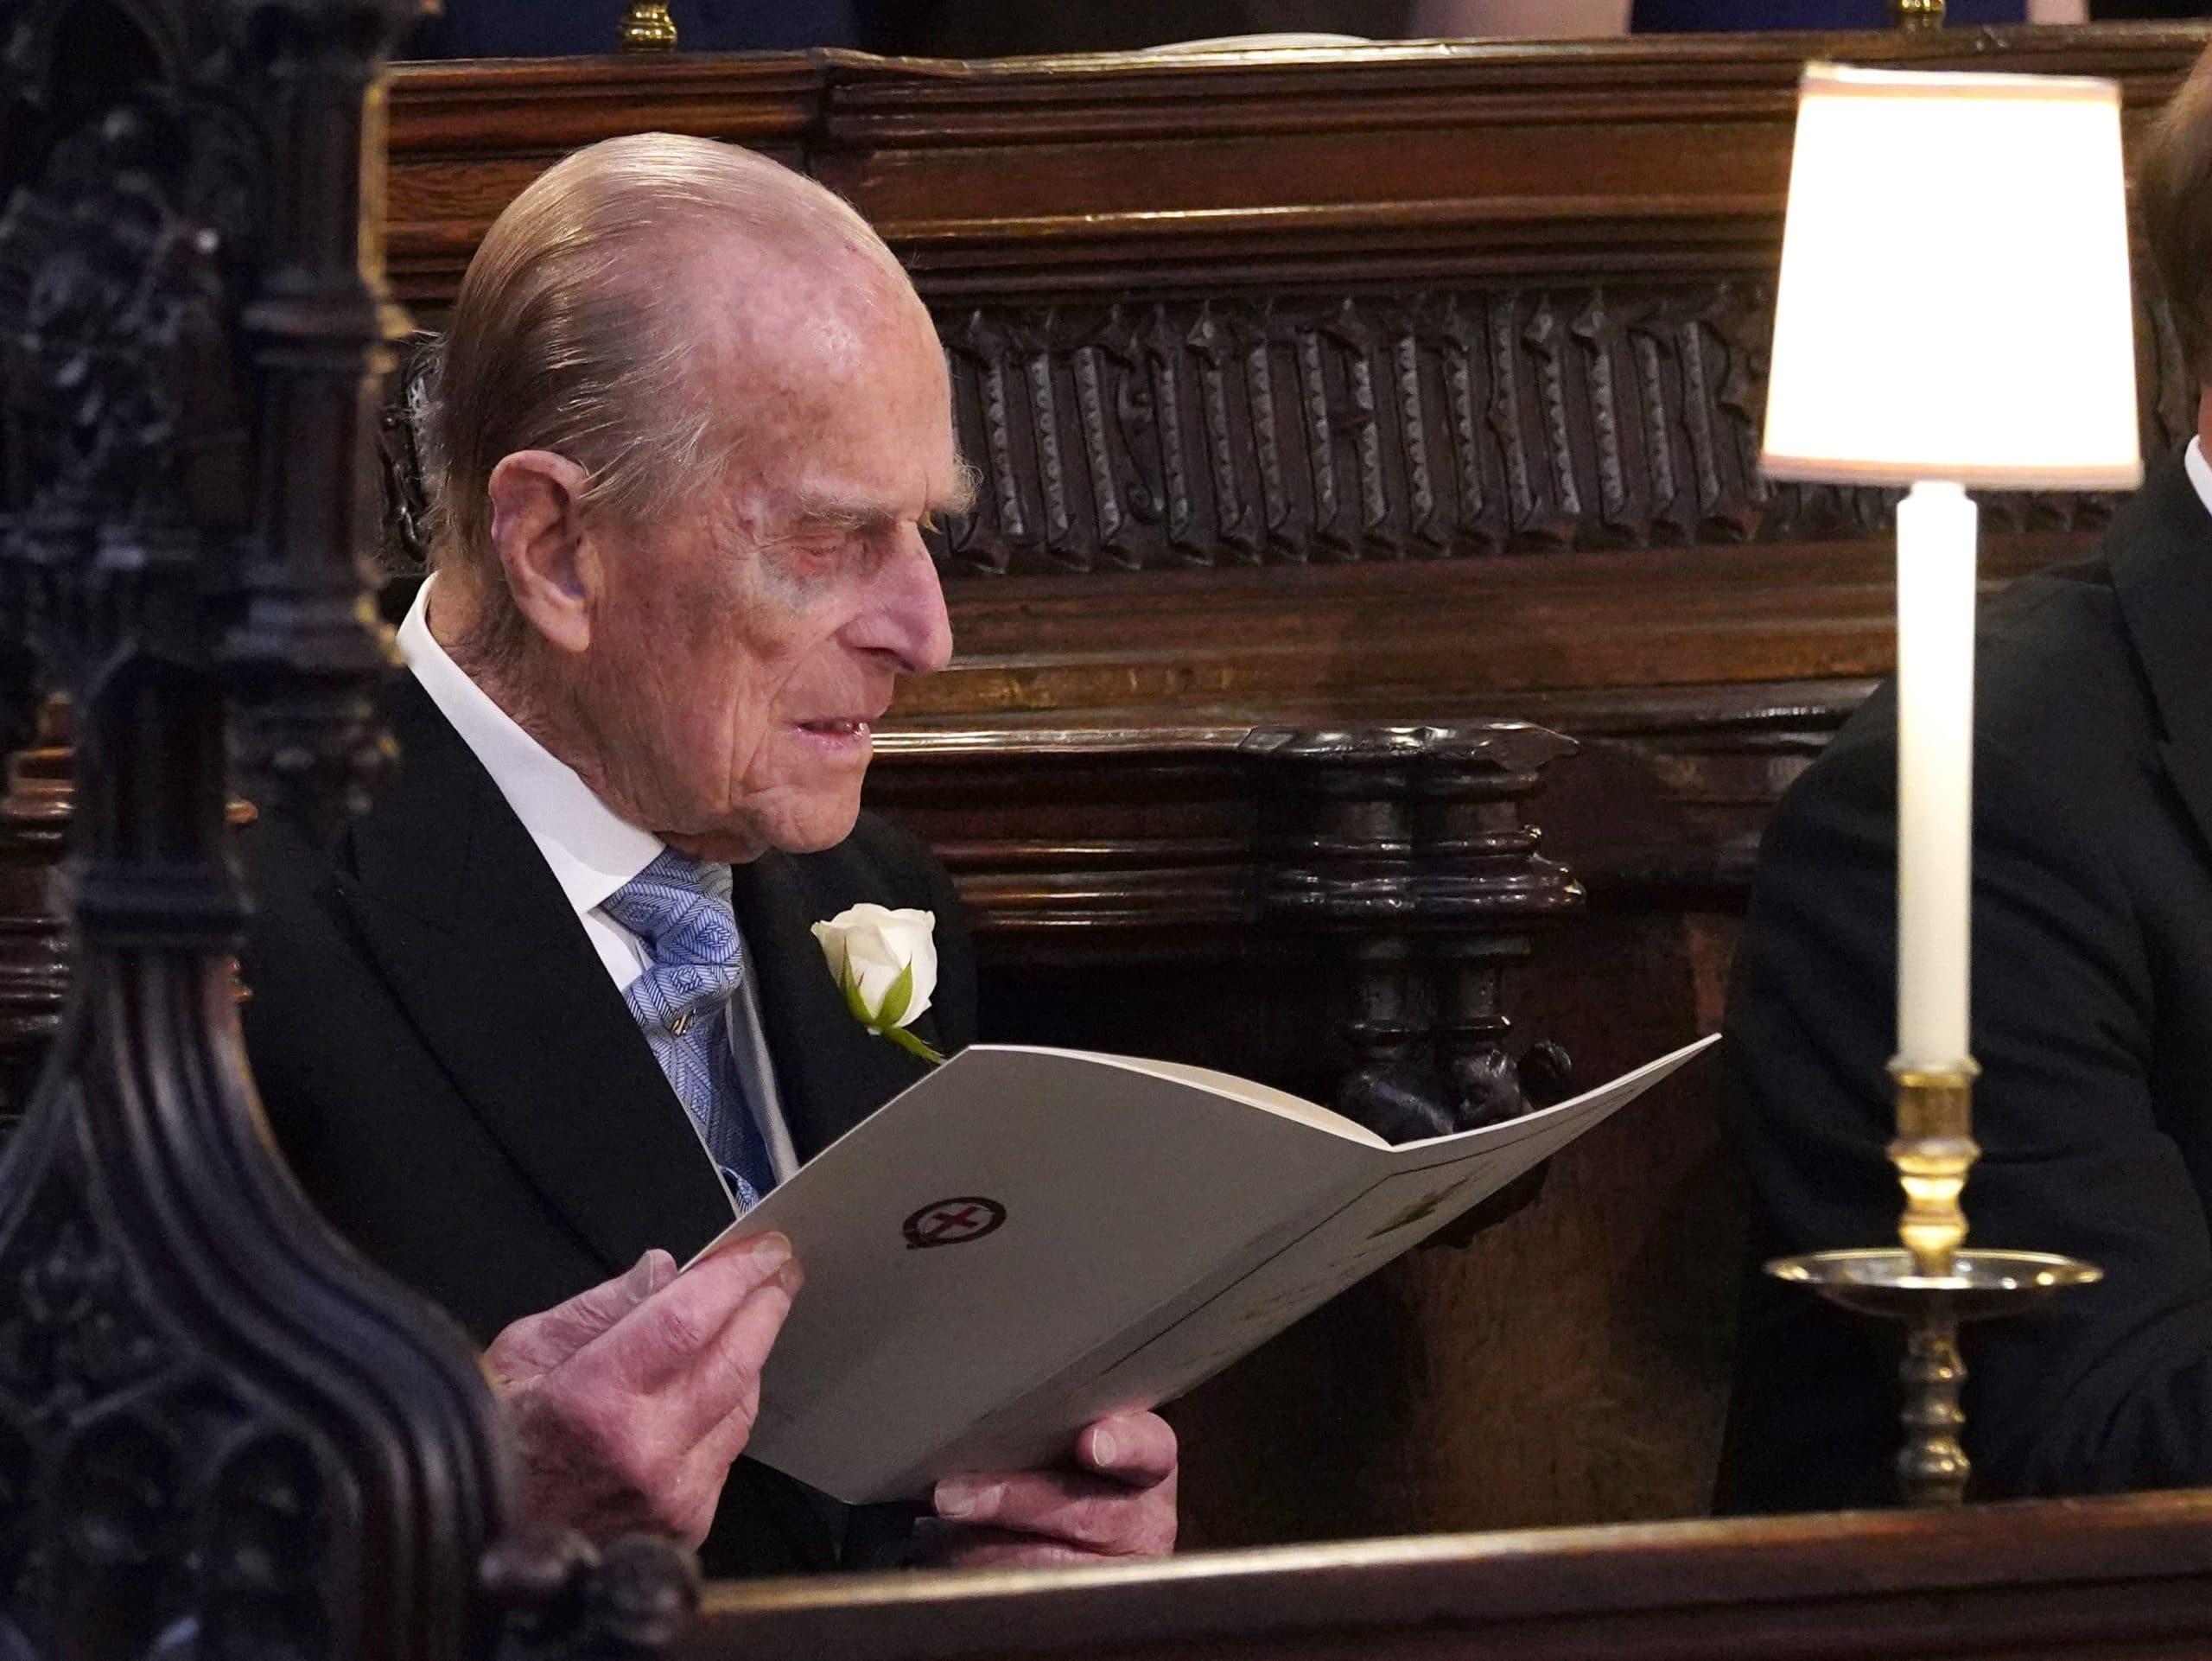 prince philip reading